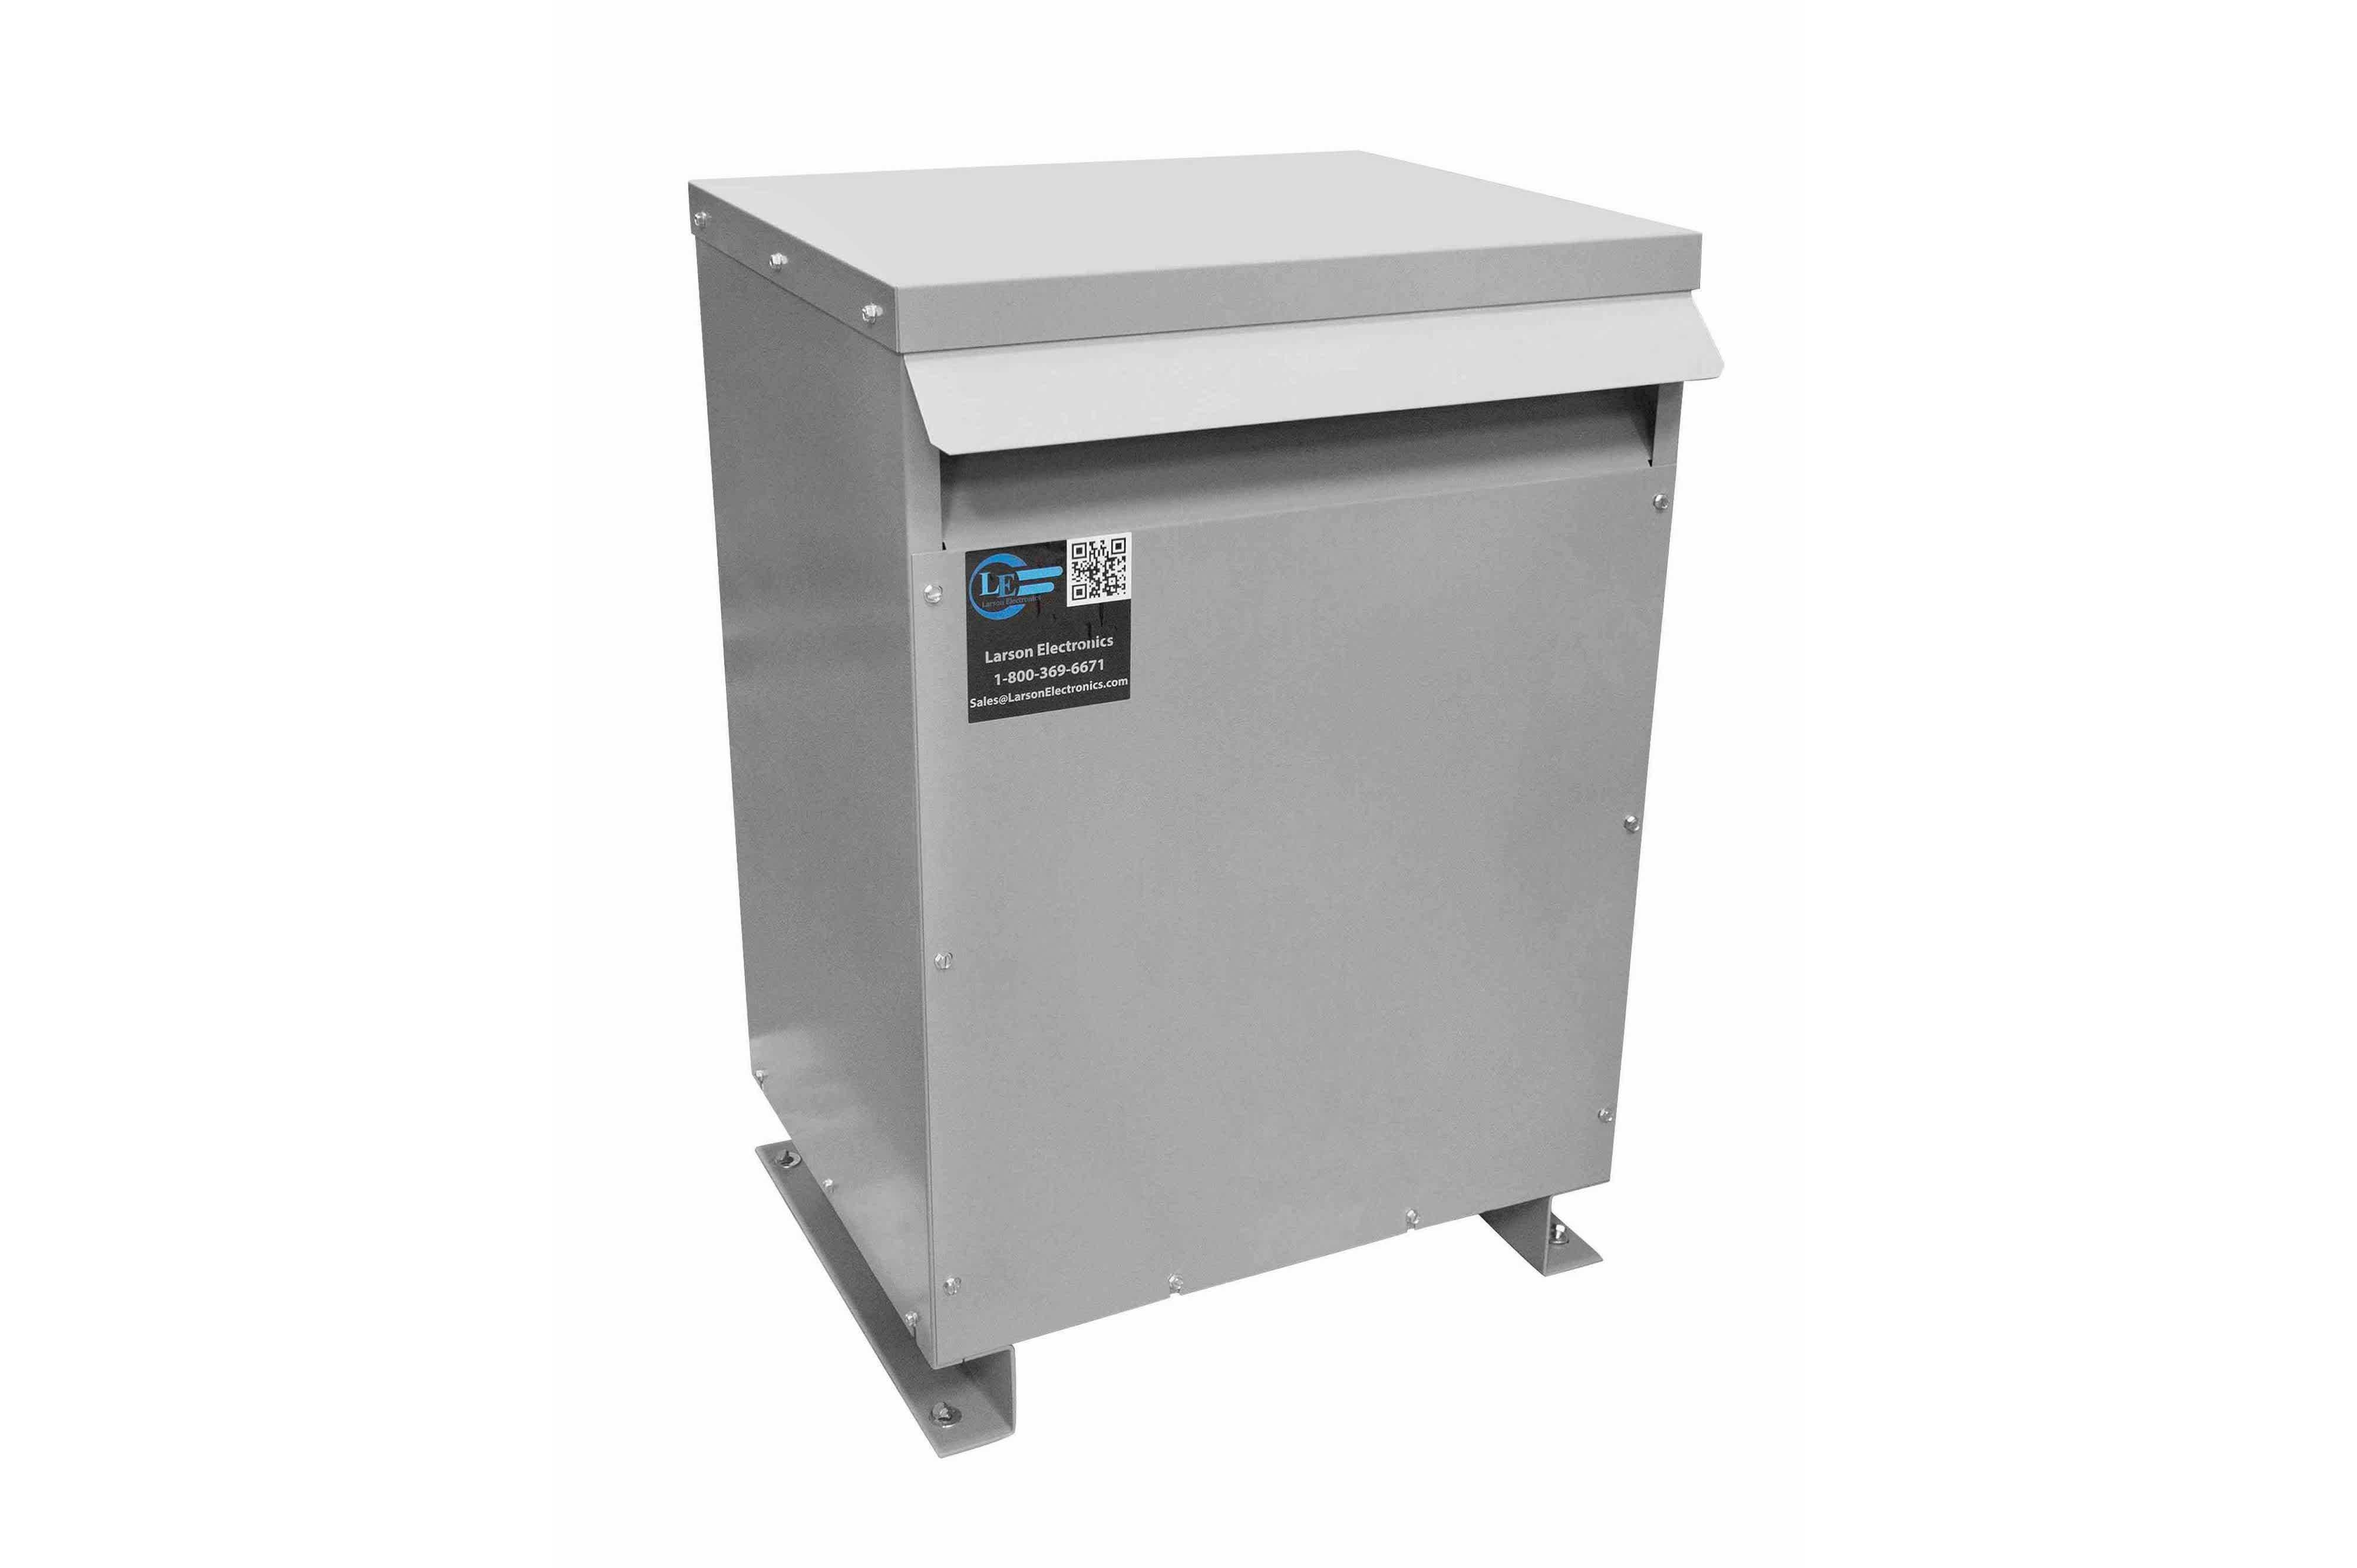 18 kVA 3PH Isolation Transformer, 480V Wye Primary, 575Y/332 Wye-N Secondary, N3R, Ventilated, 60 Hz